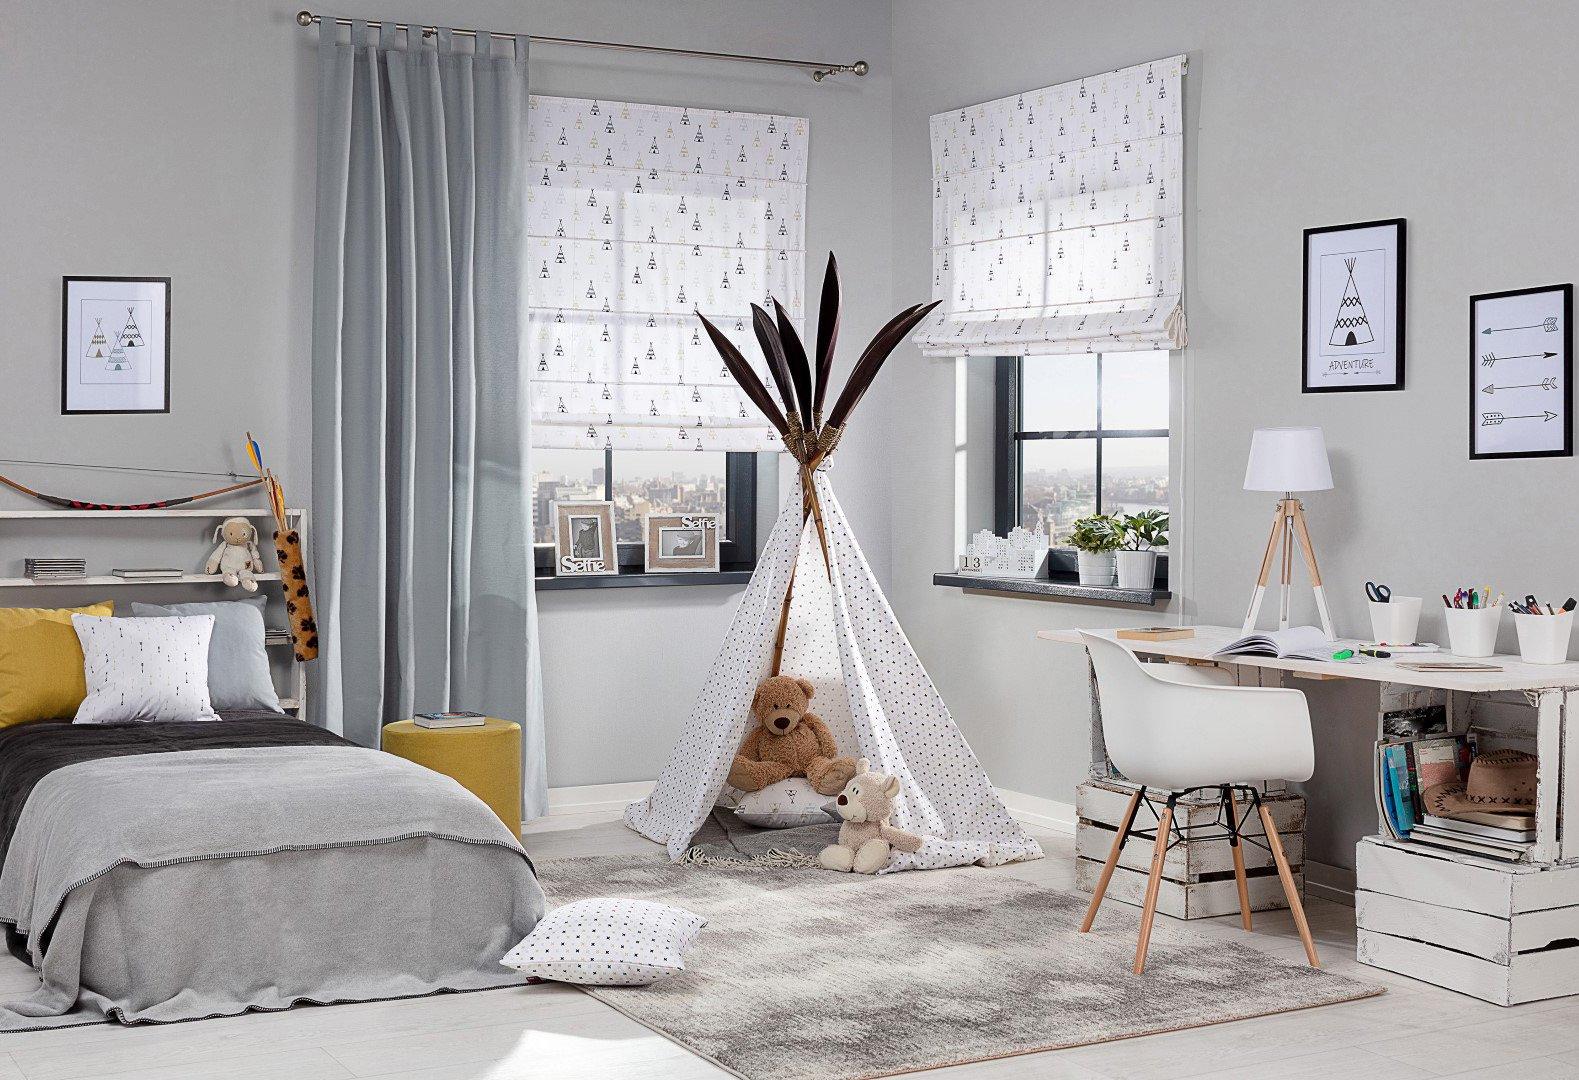 Izba malého indiána